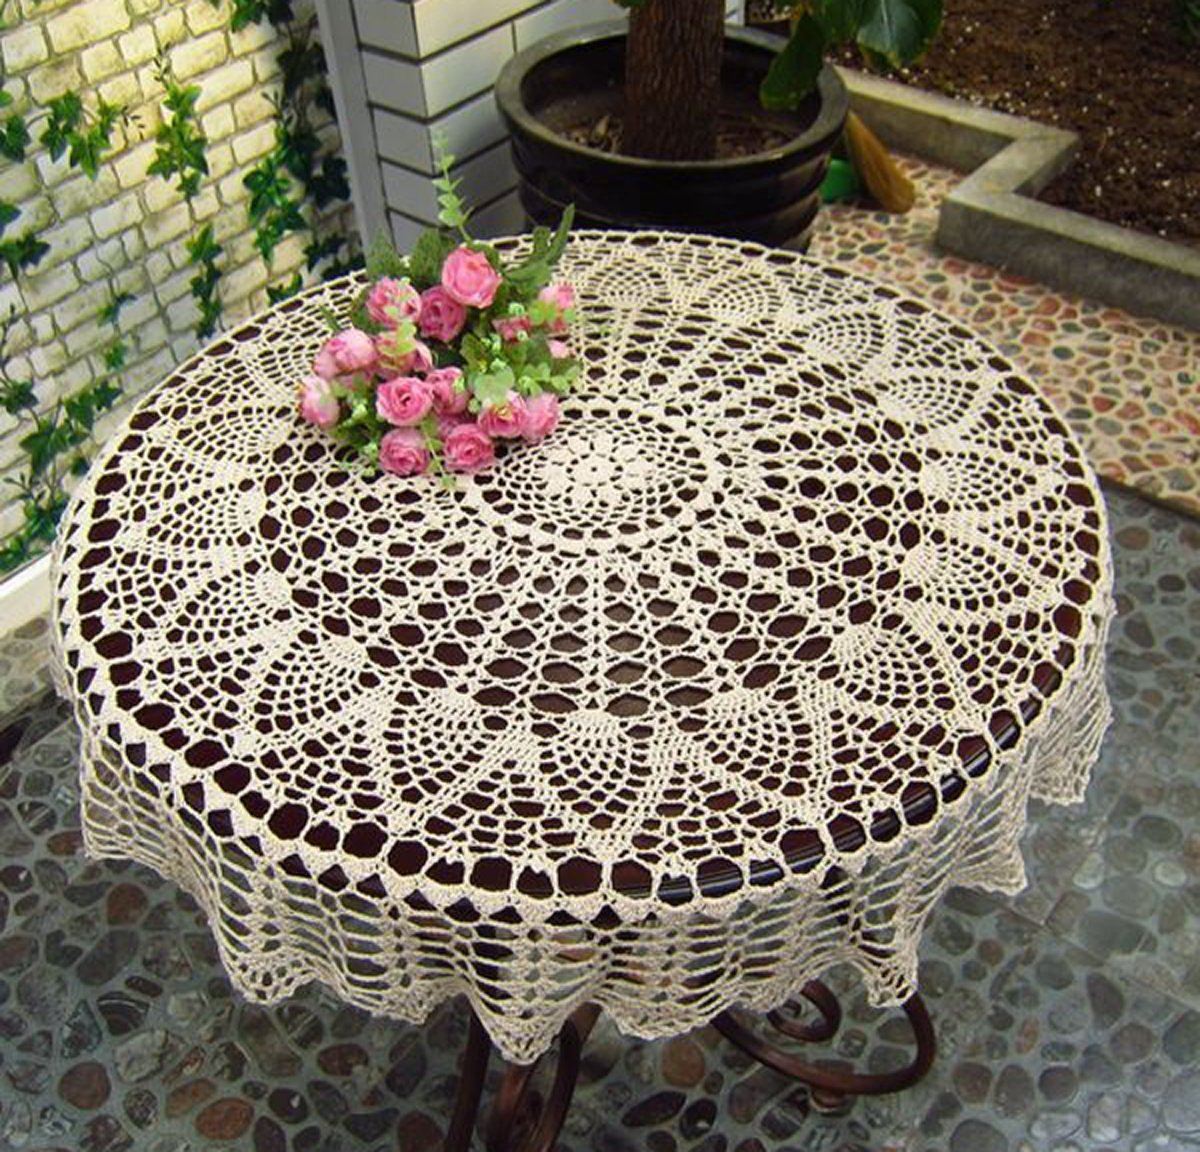 Amazon.com: Hommey New Beige 36\'\' Round Handmade Crochet Sunflower ...